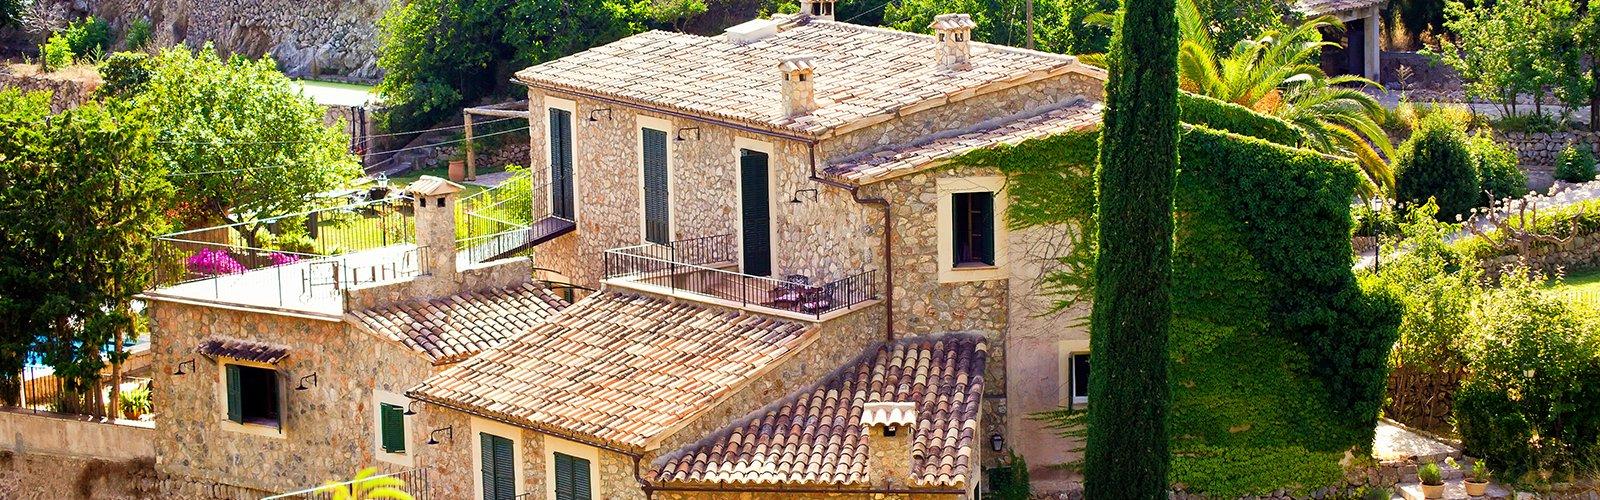 Edles Steinhaus auf Mallorca